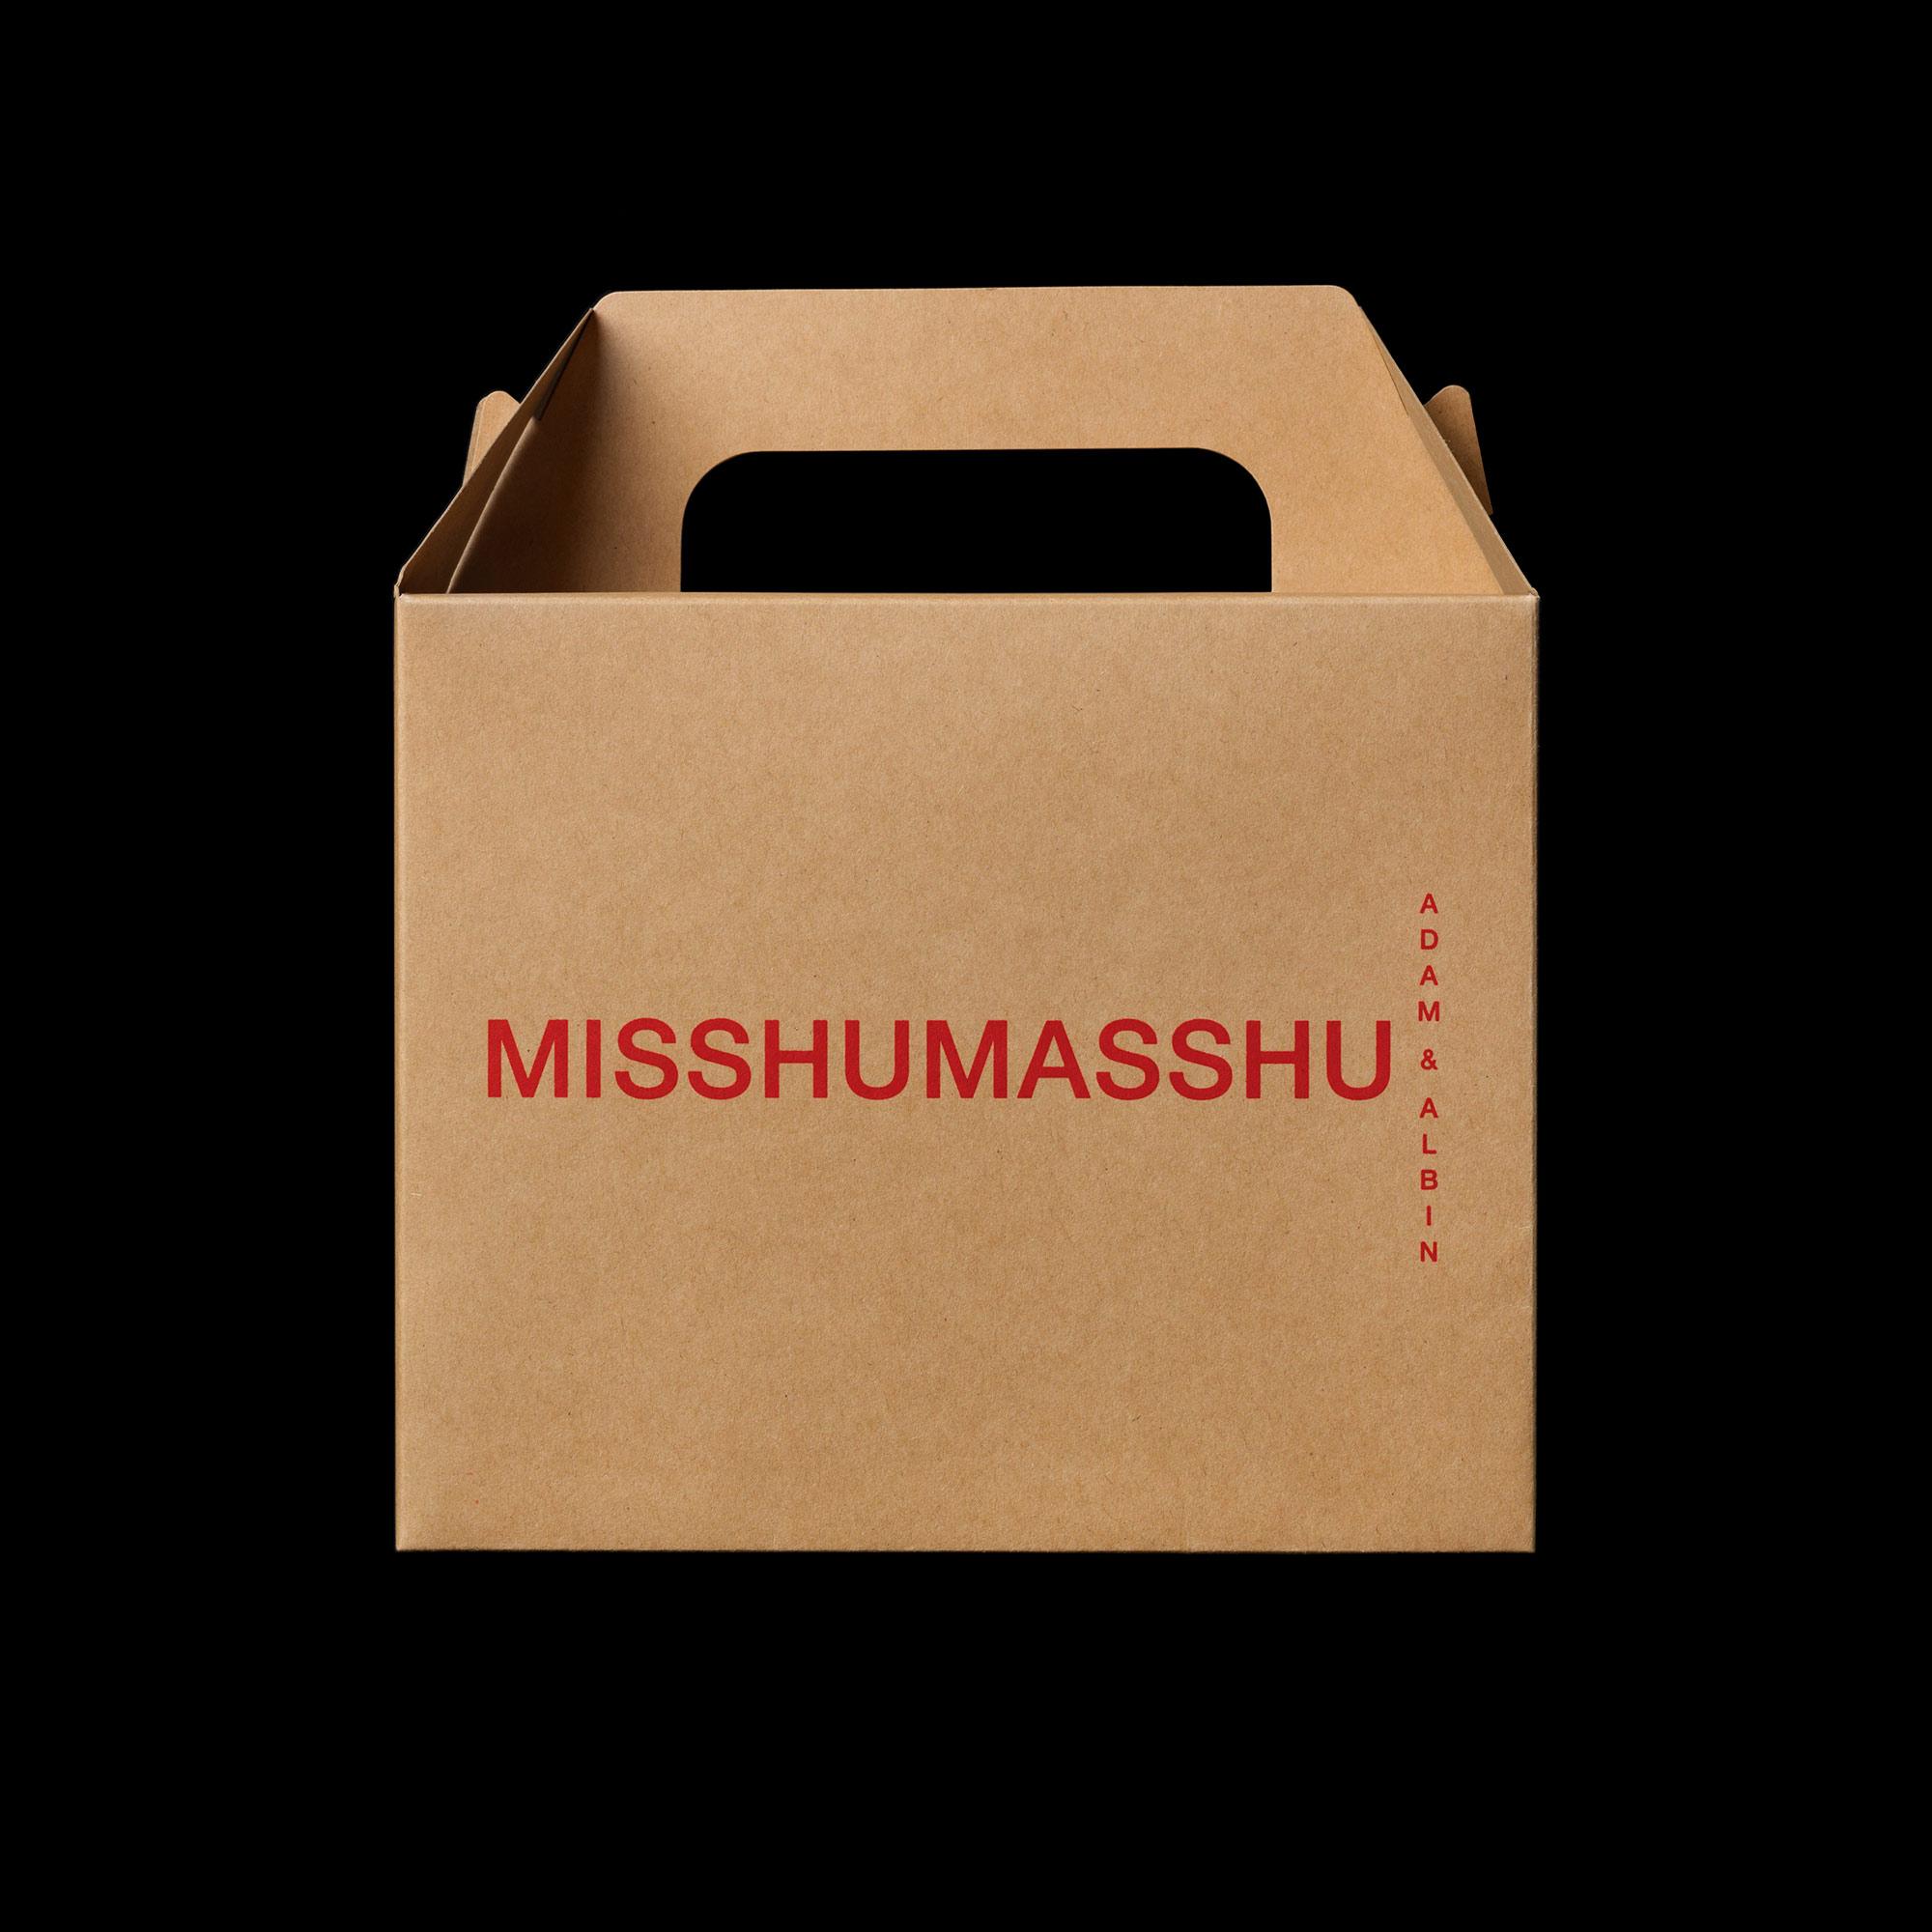 MisshuMasshu-Insta-3.jpg